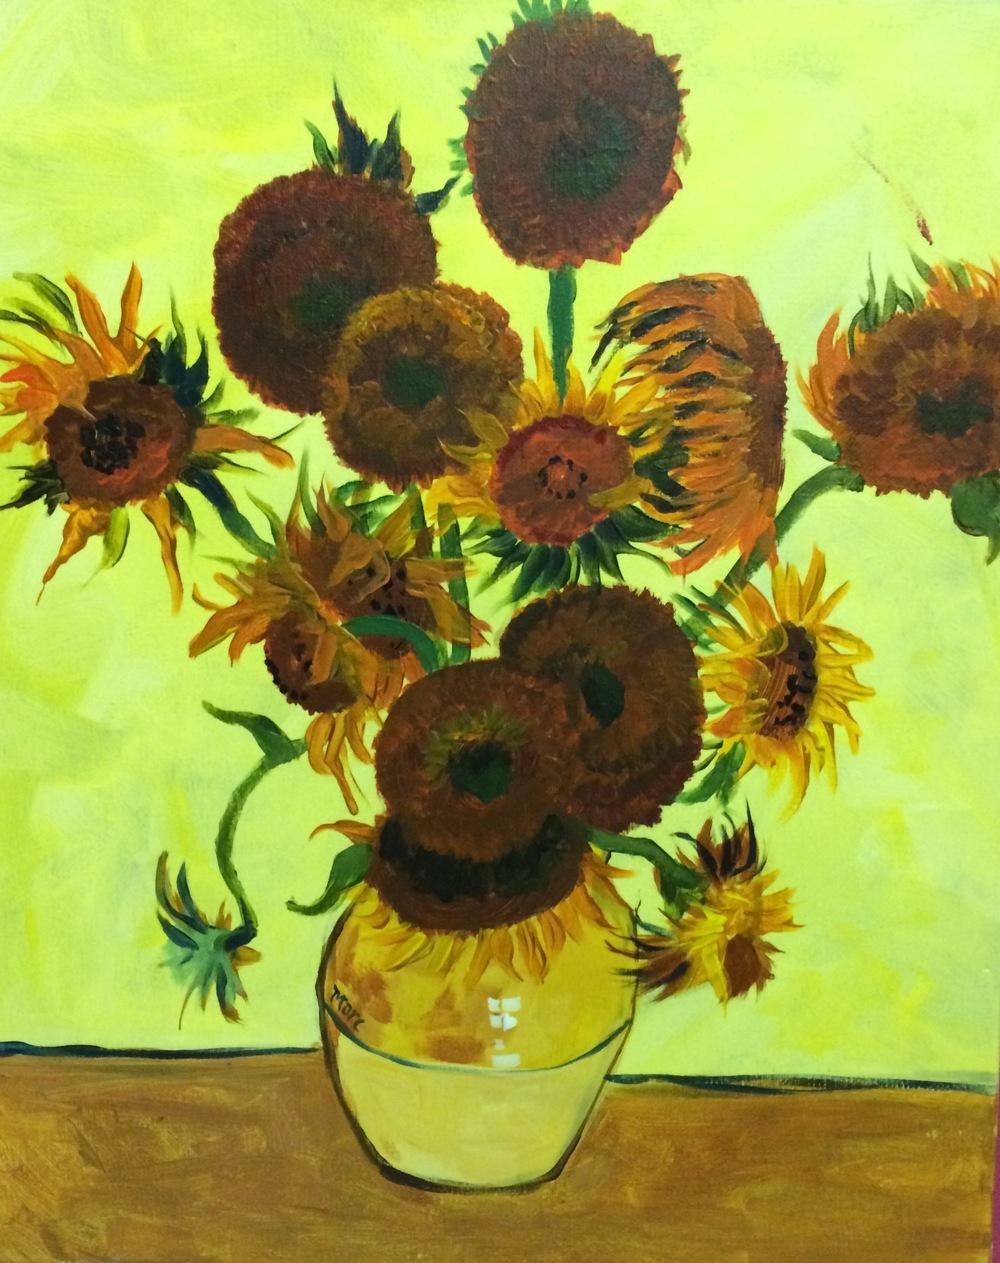 van gogh sun flower.jpg